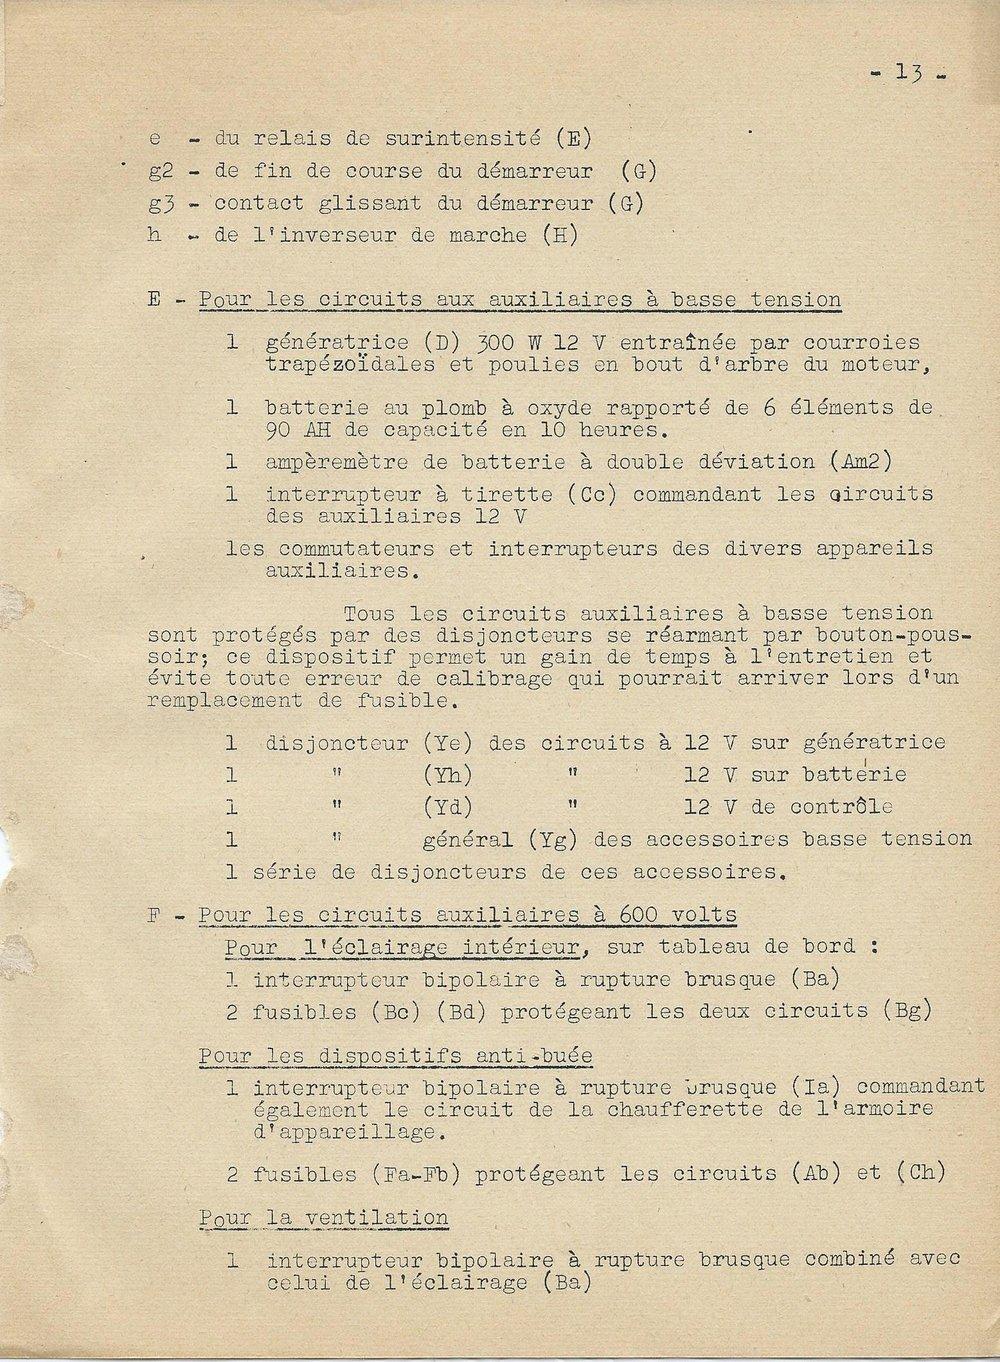 VRBh, série Aix-Marseille, str. 1